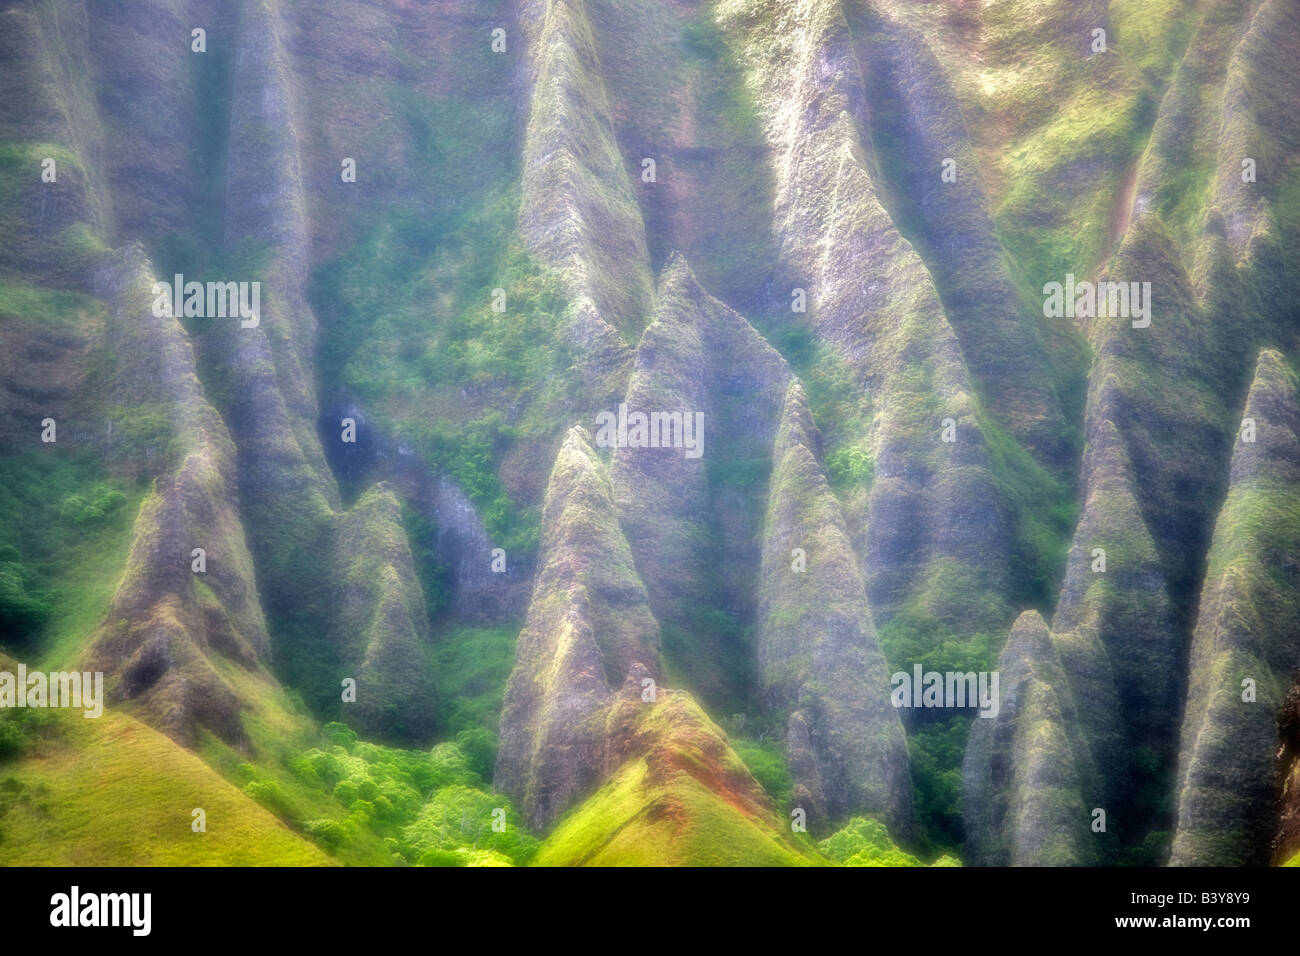 Jagged peaks in fog off Napali Coast Kauai Hawaii - Stock Image